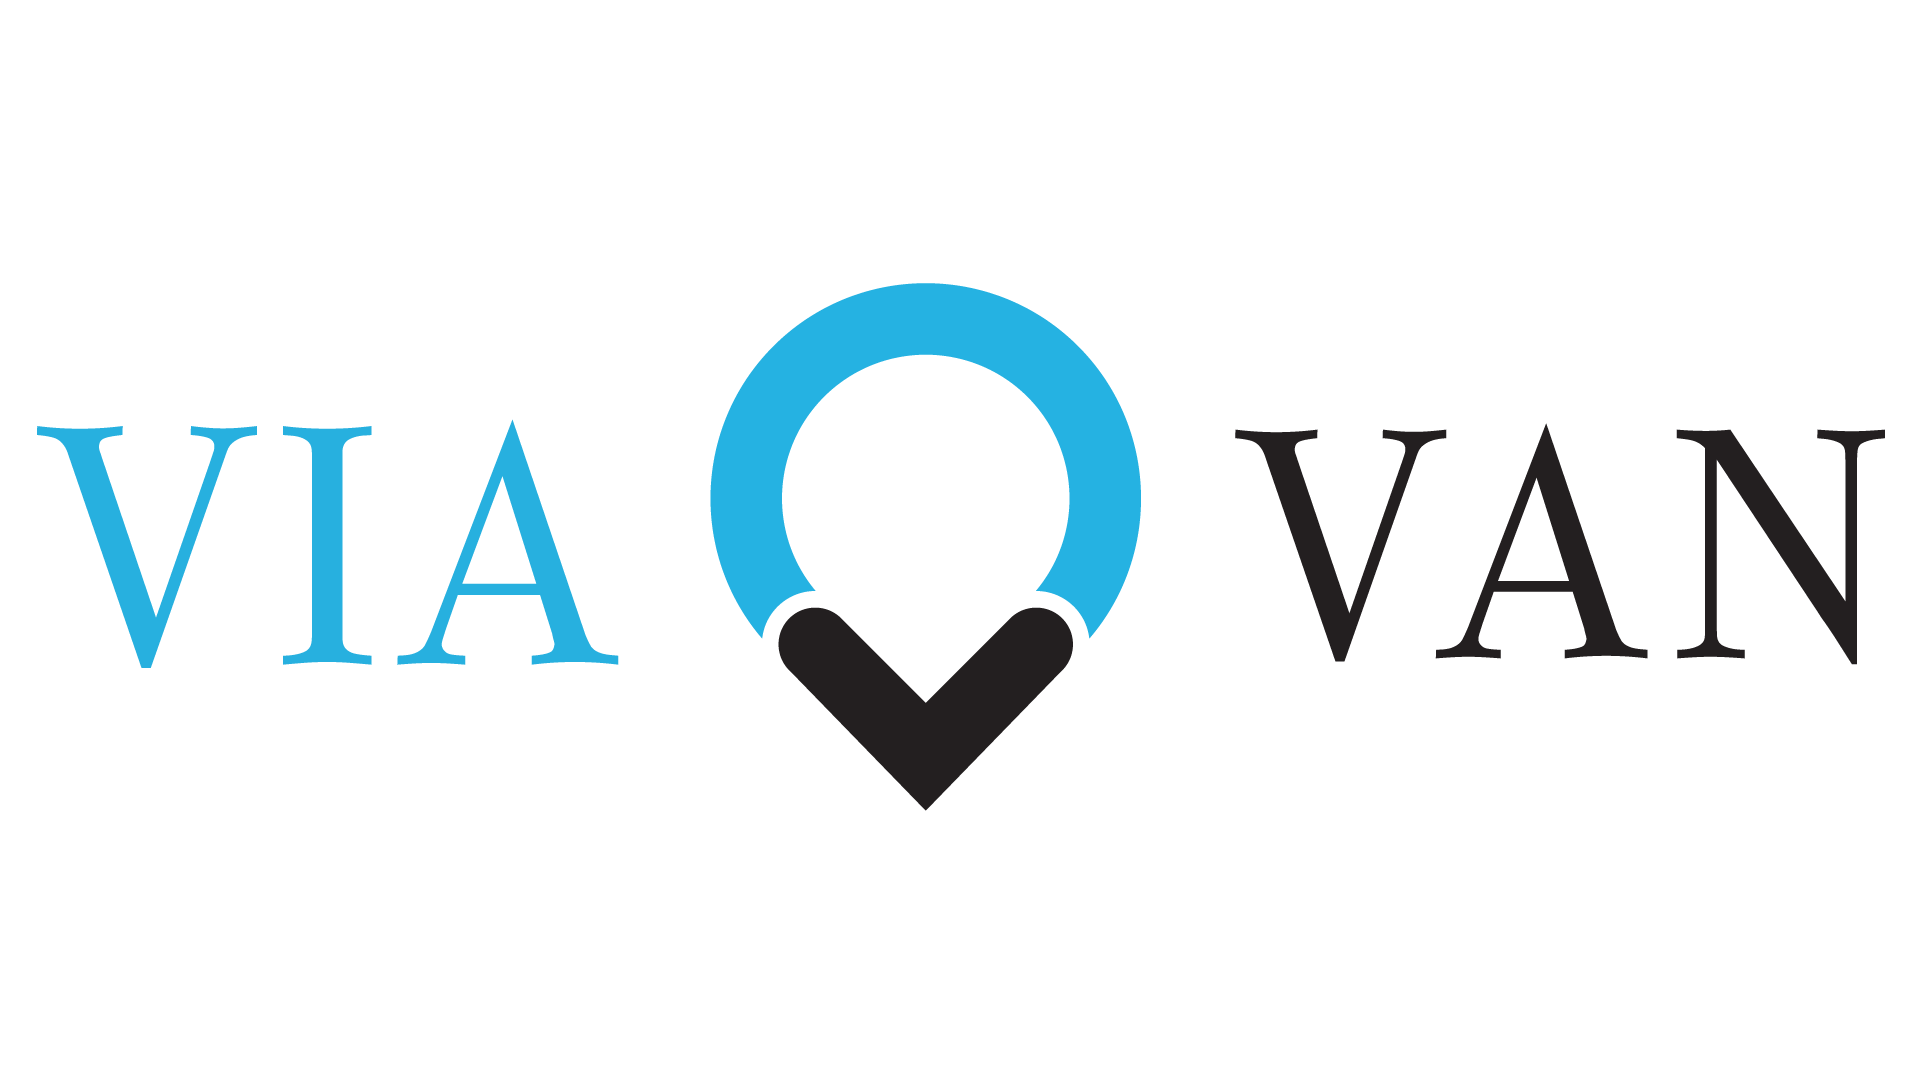 ViaVan Joint Venture Via & Daimler AG